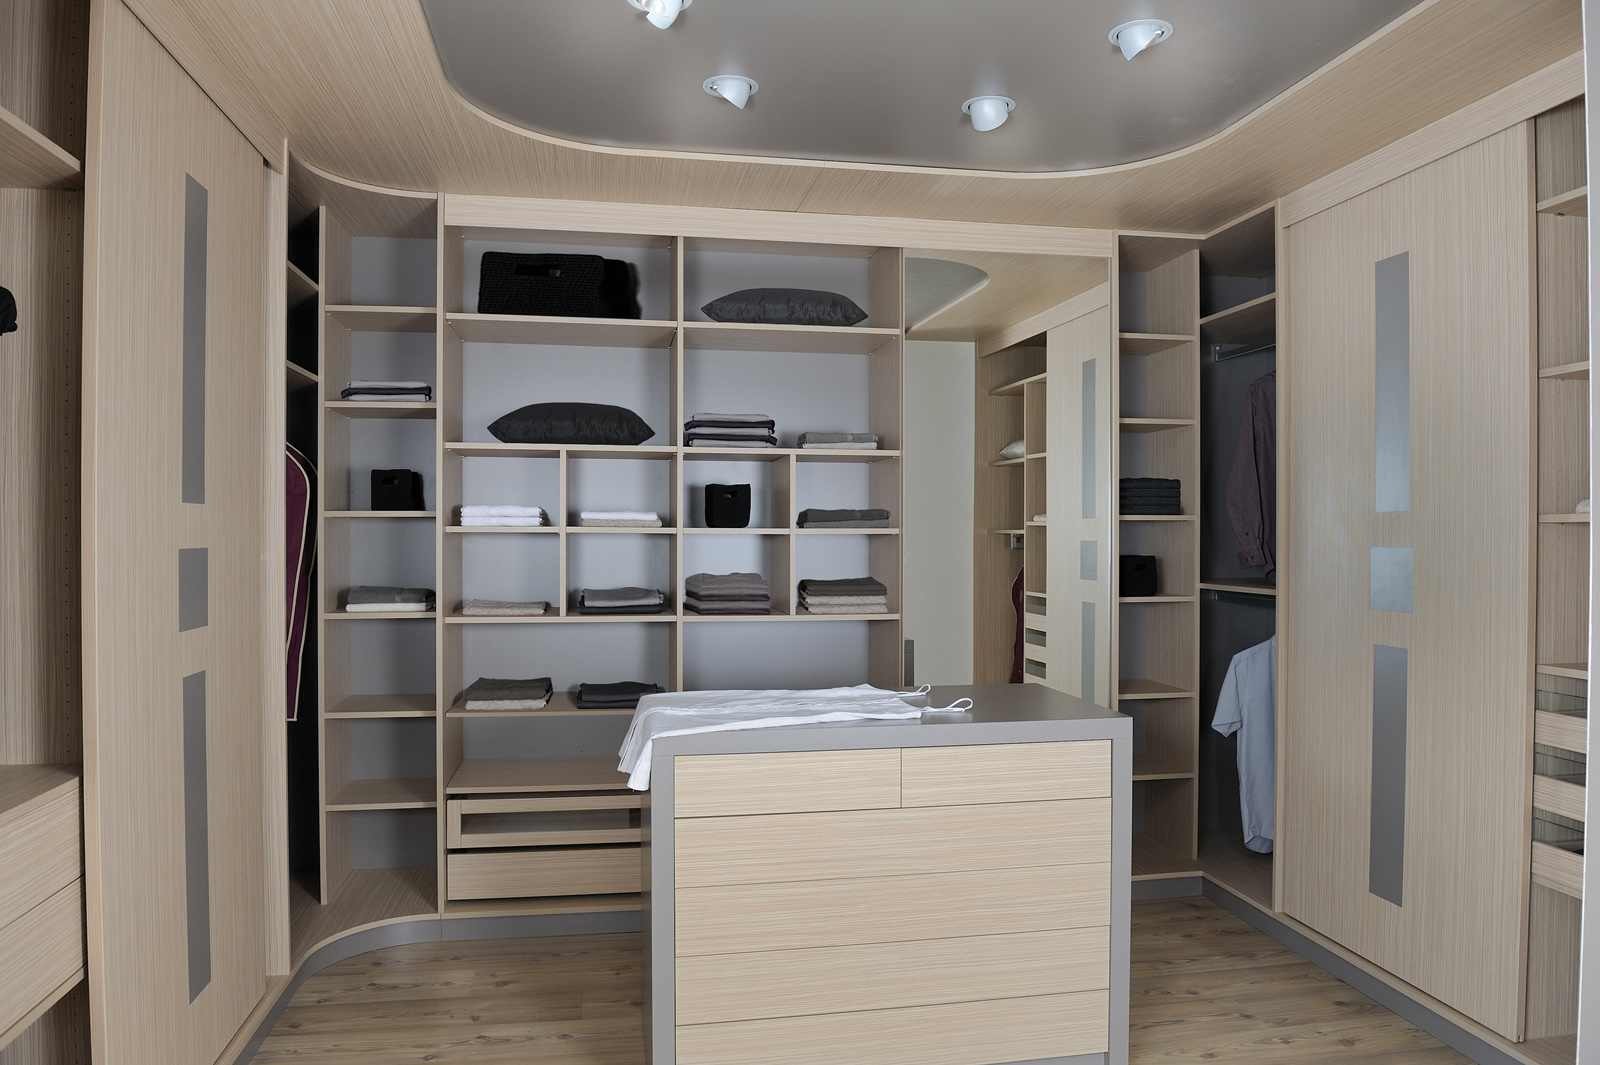 dressing cuisines couloir. Black Bedroom Furniture Sets. Home Design Ideas